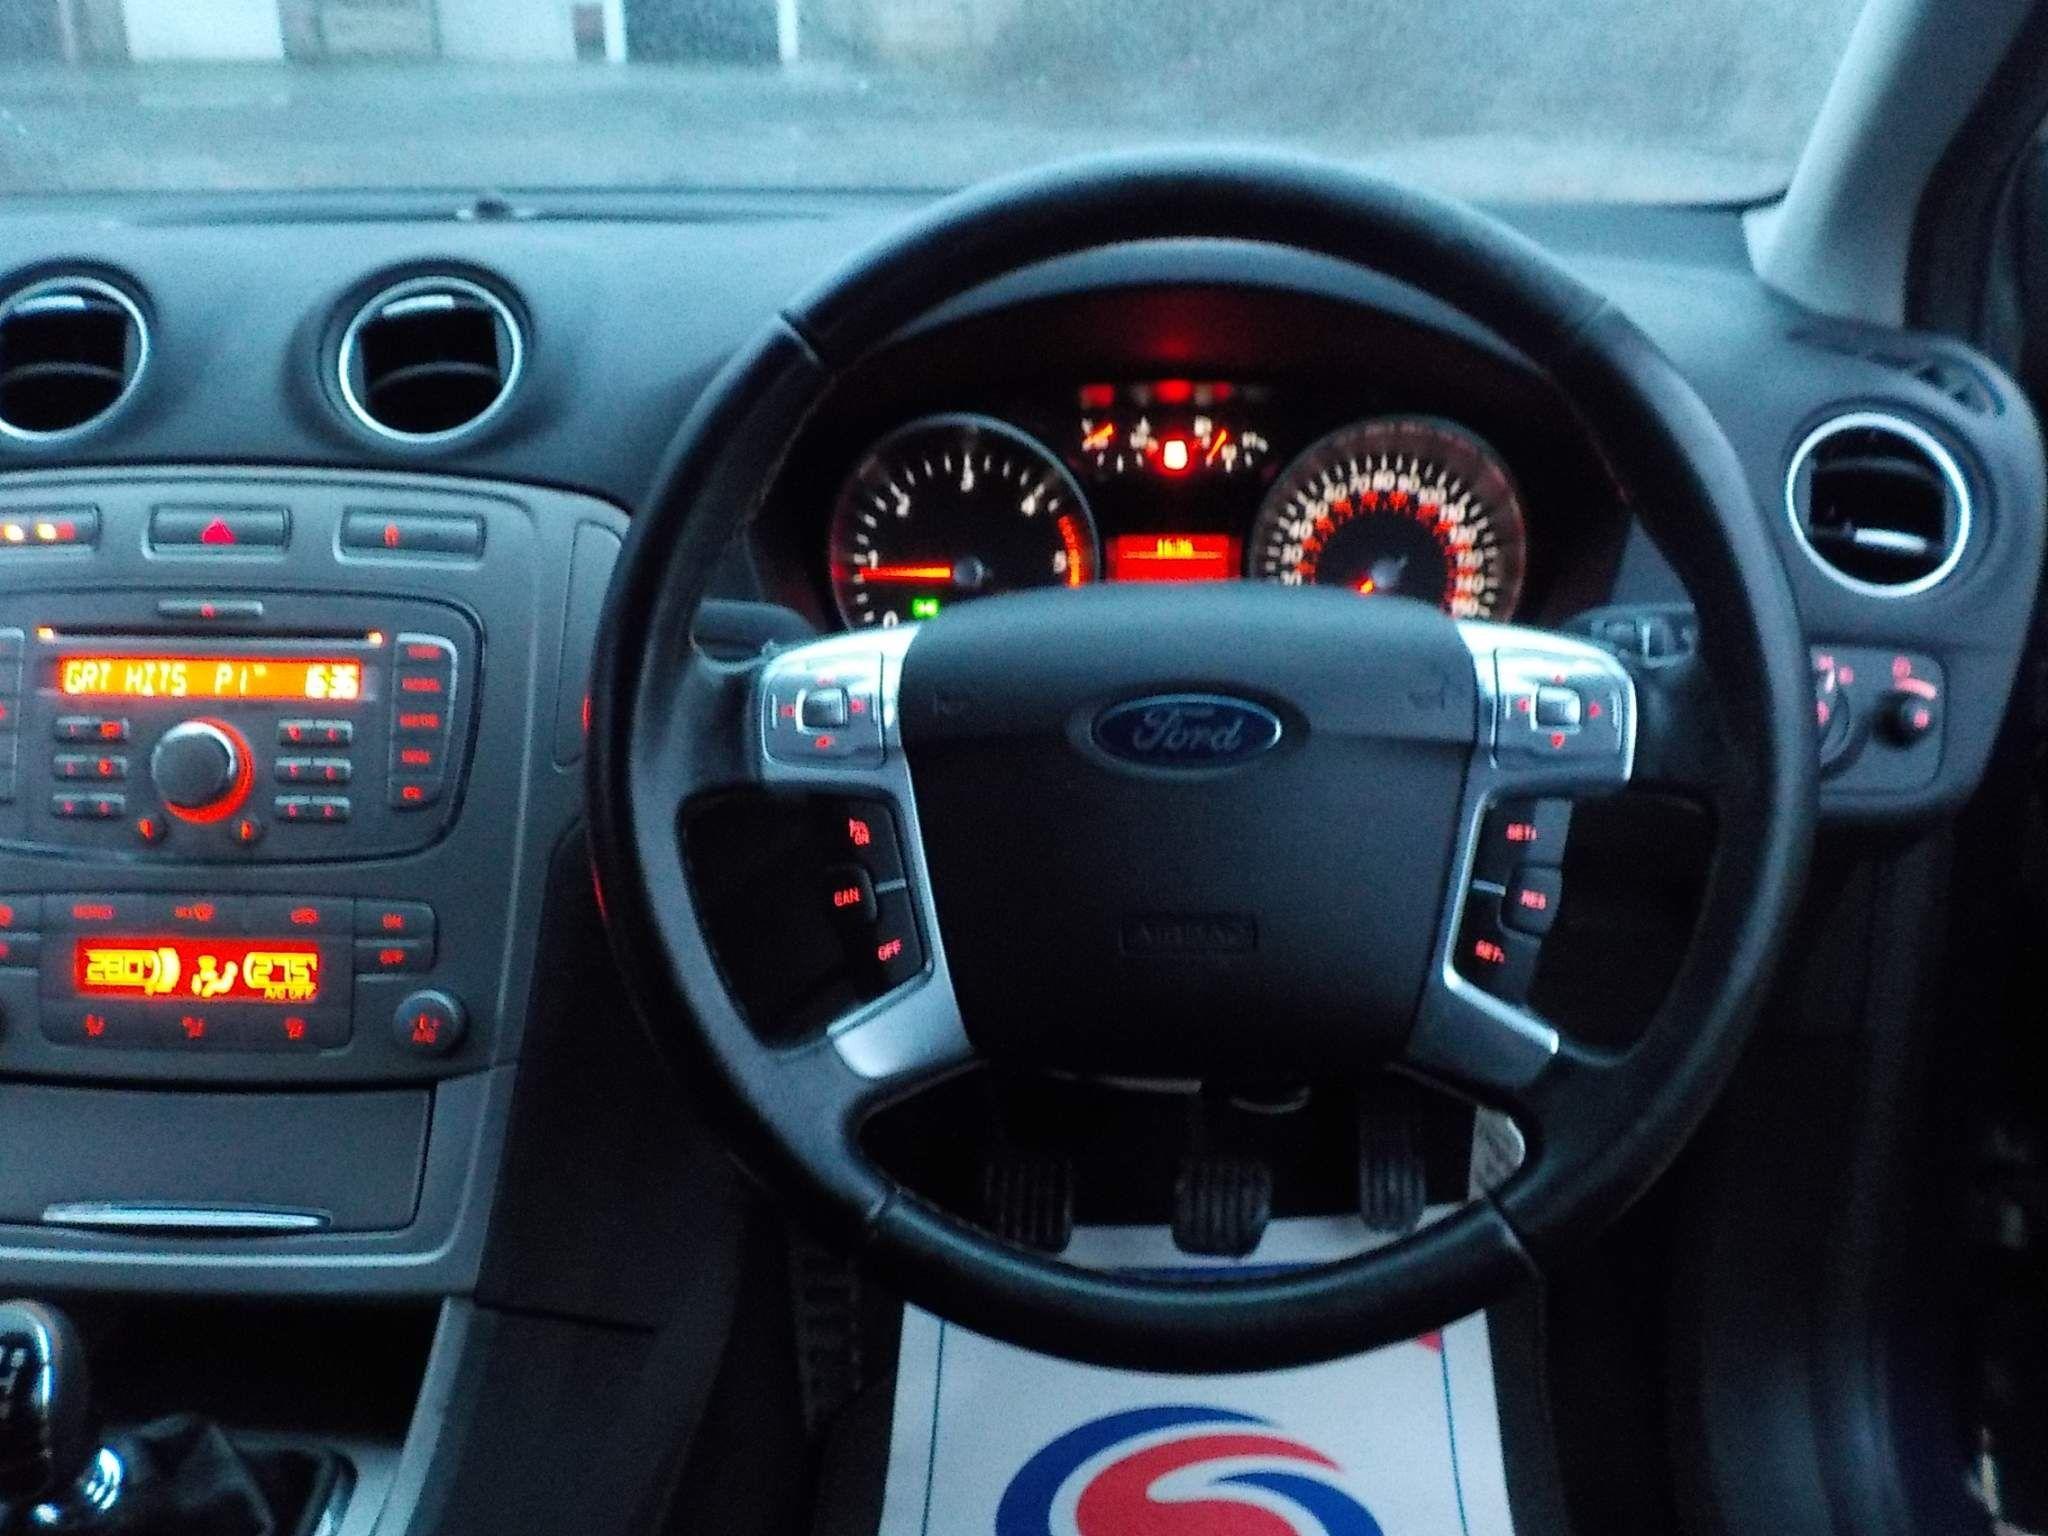 Ford Mondeo 2.0 TDCi Zetec 5dr